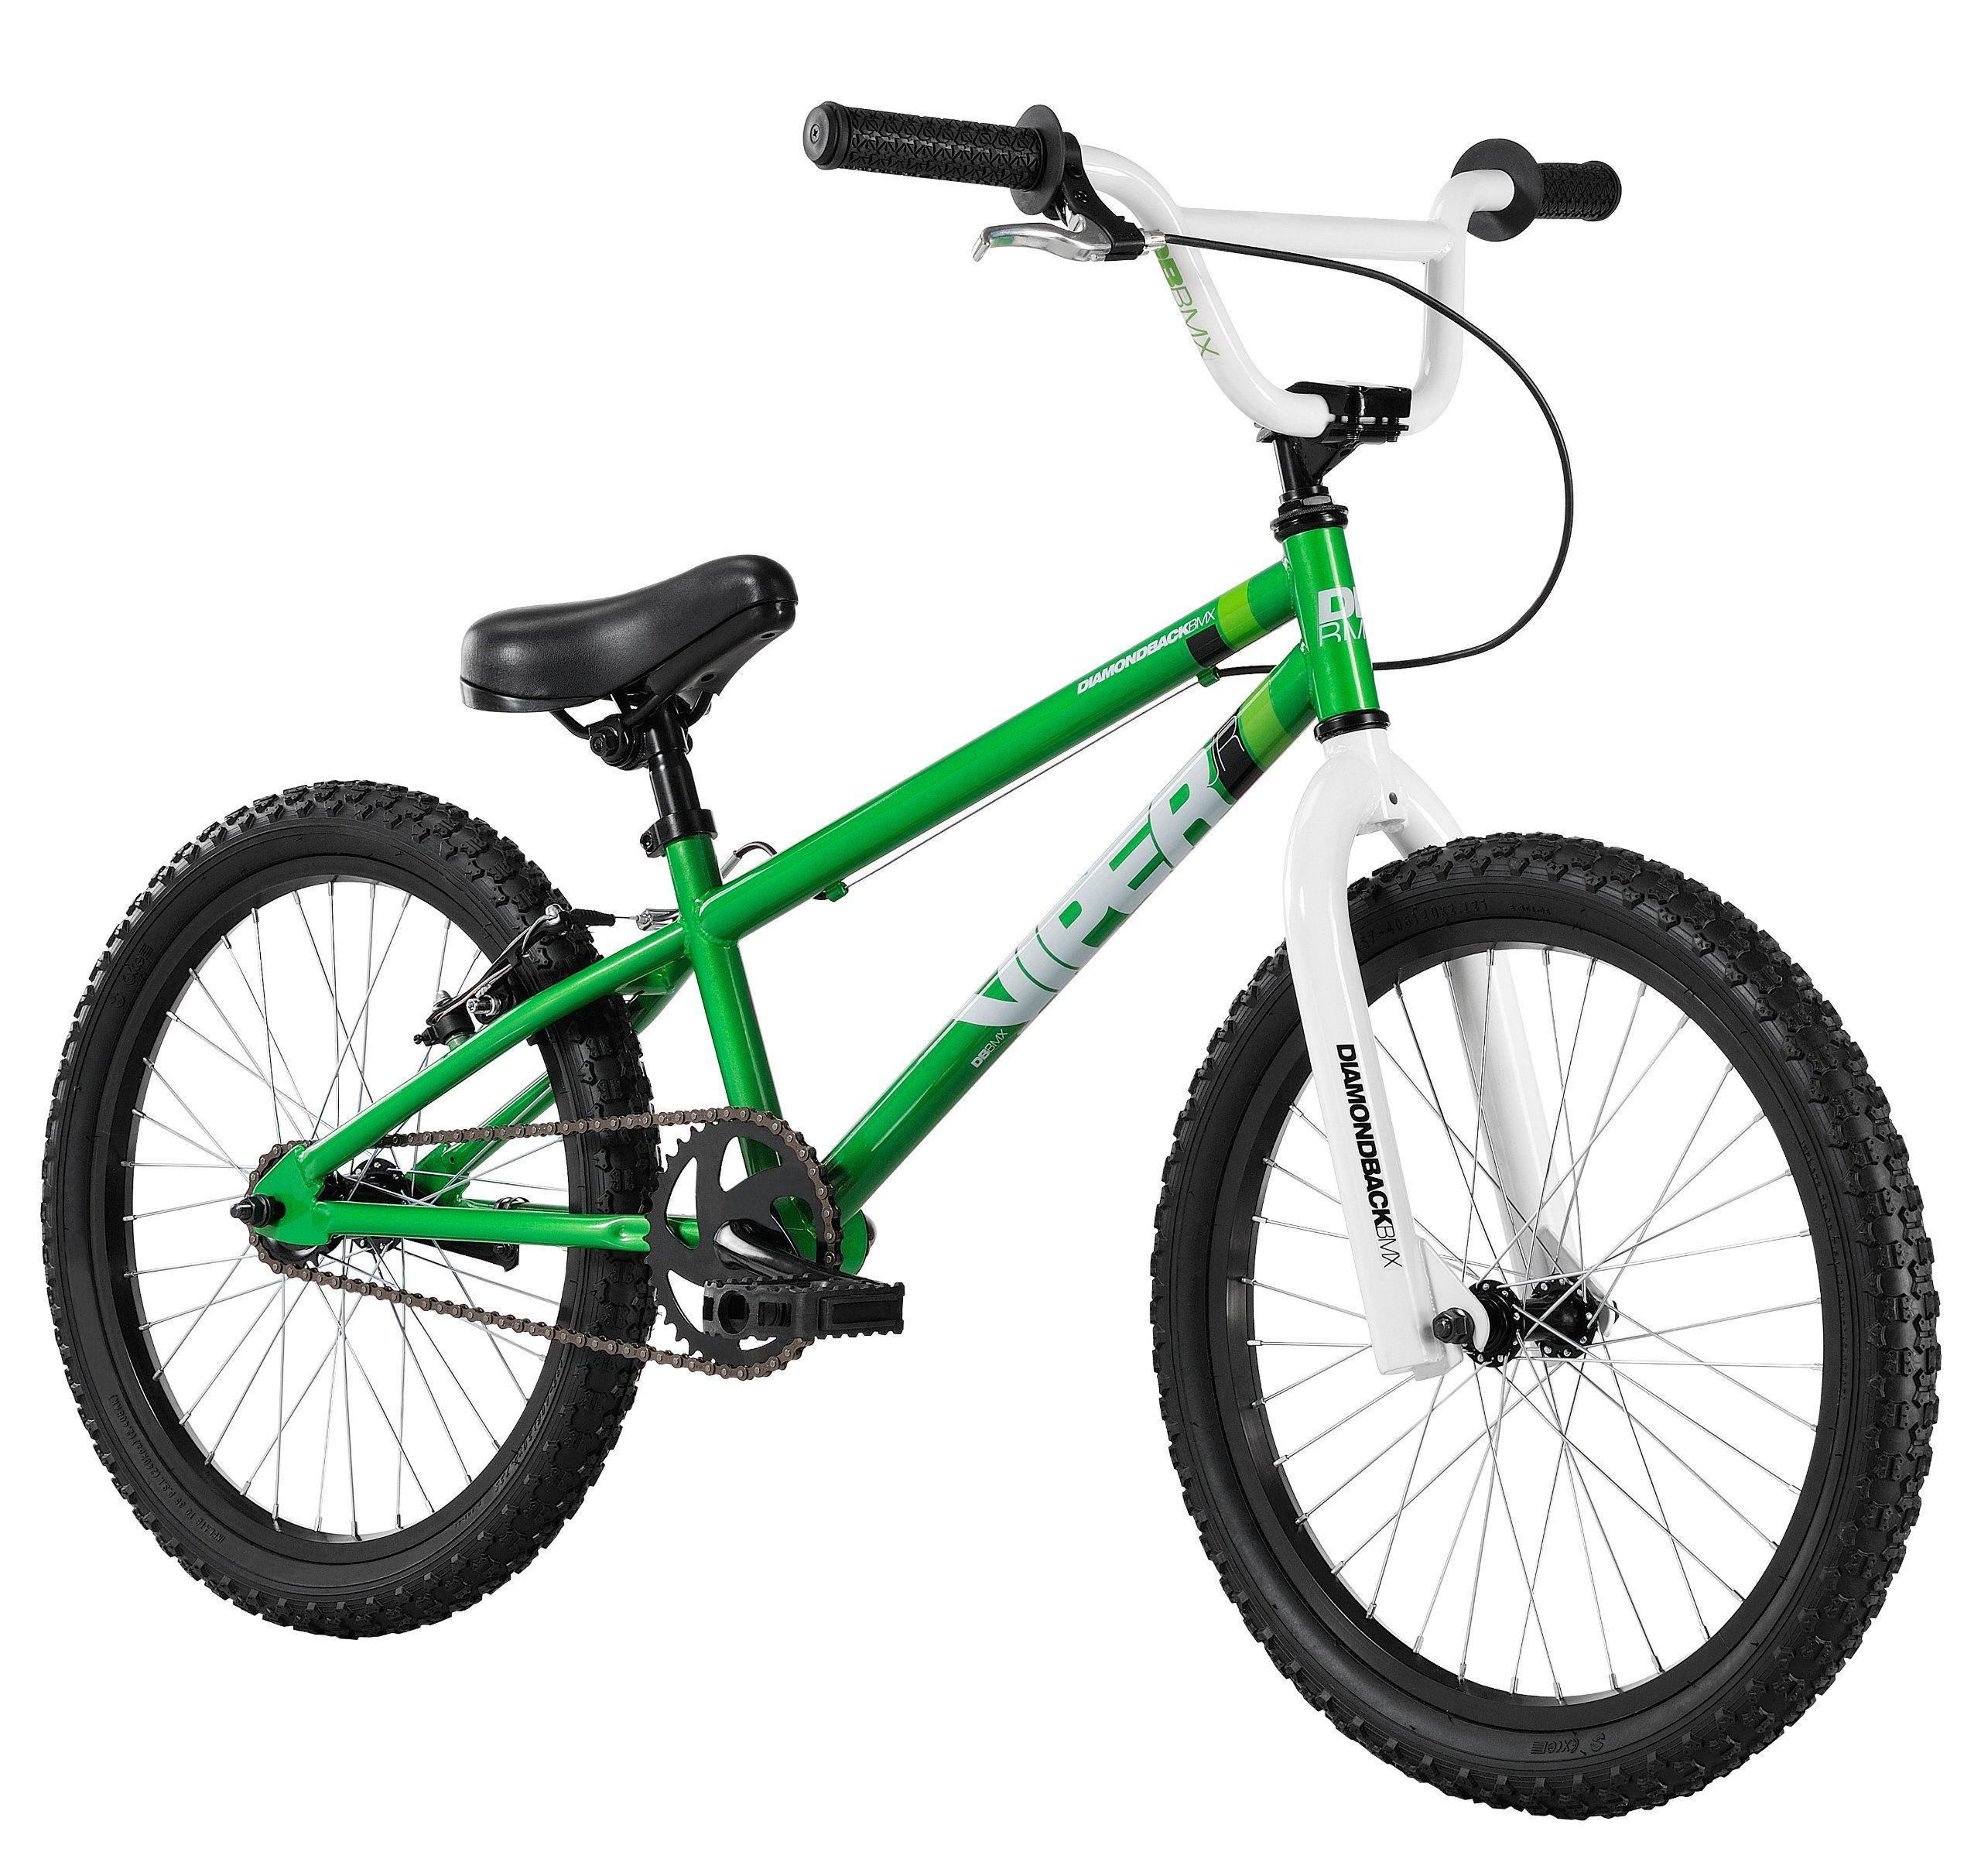 Diamondback Bicycles 2014 Viper Junior Bmx Bike 20 Inch Wheels One Size Green Best Bmx Bmx Bikes Bmx